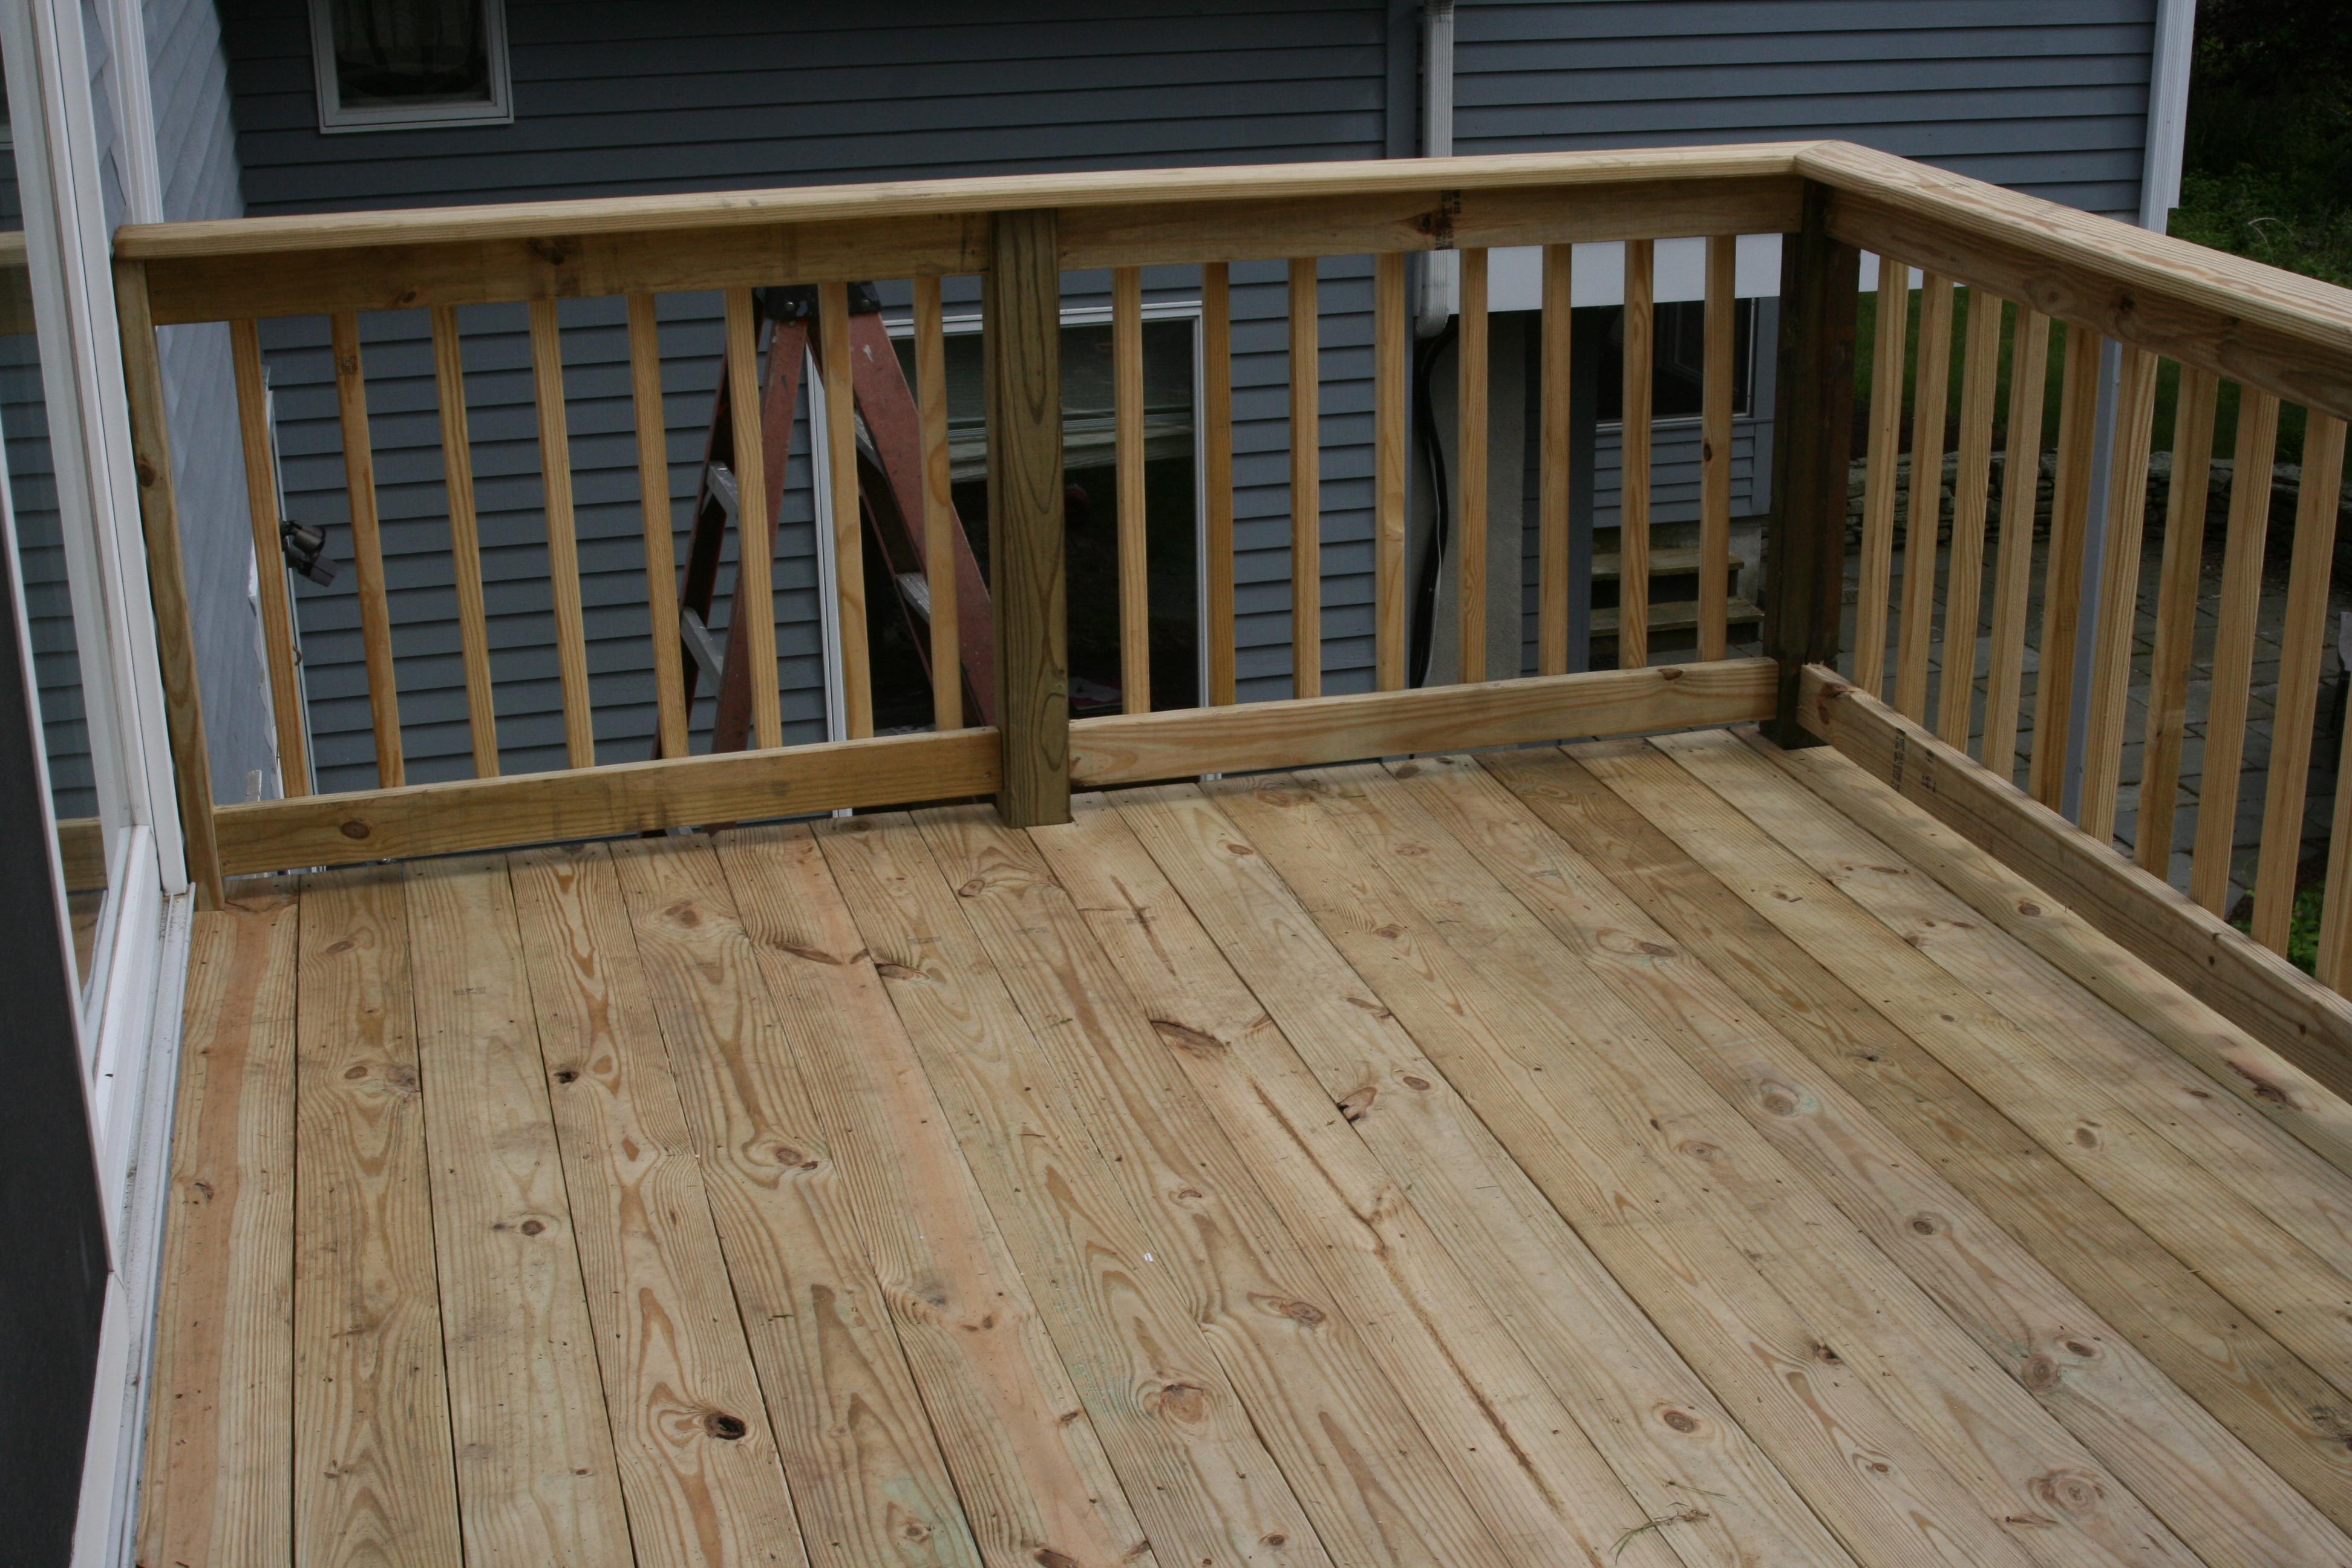 Refurbished second floor deck: Decking planks and railings